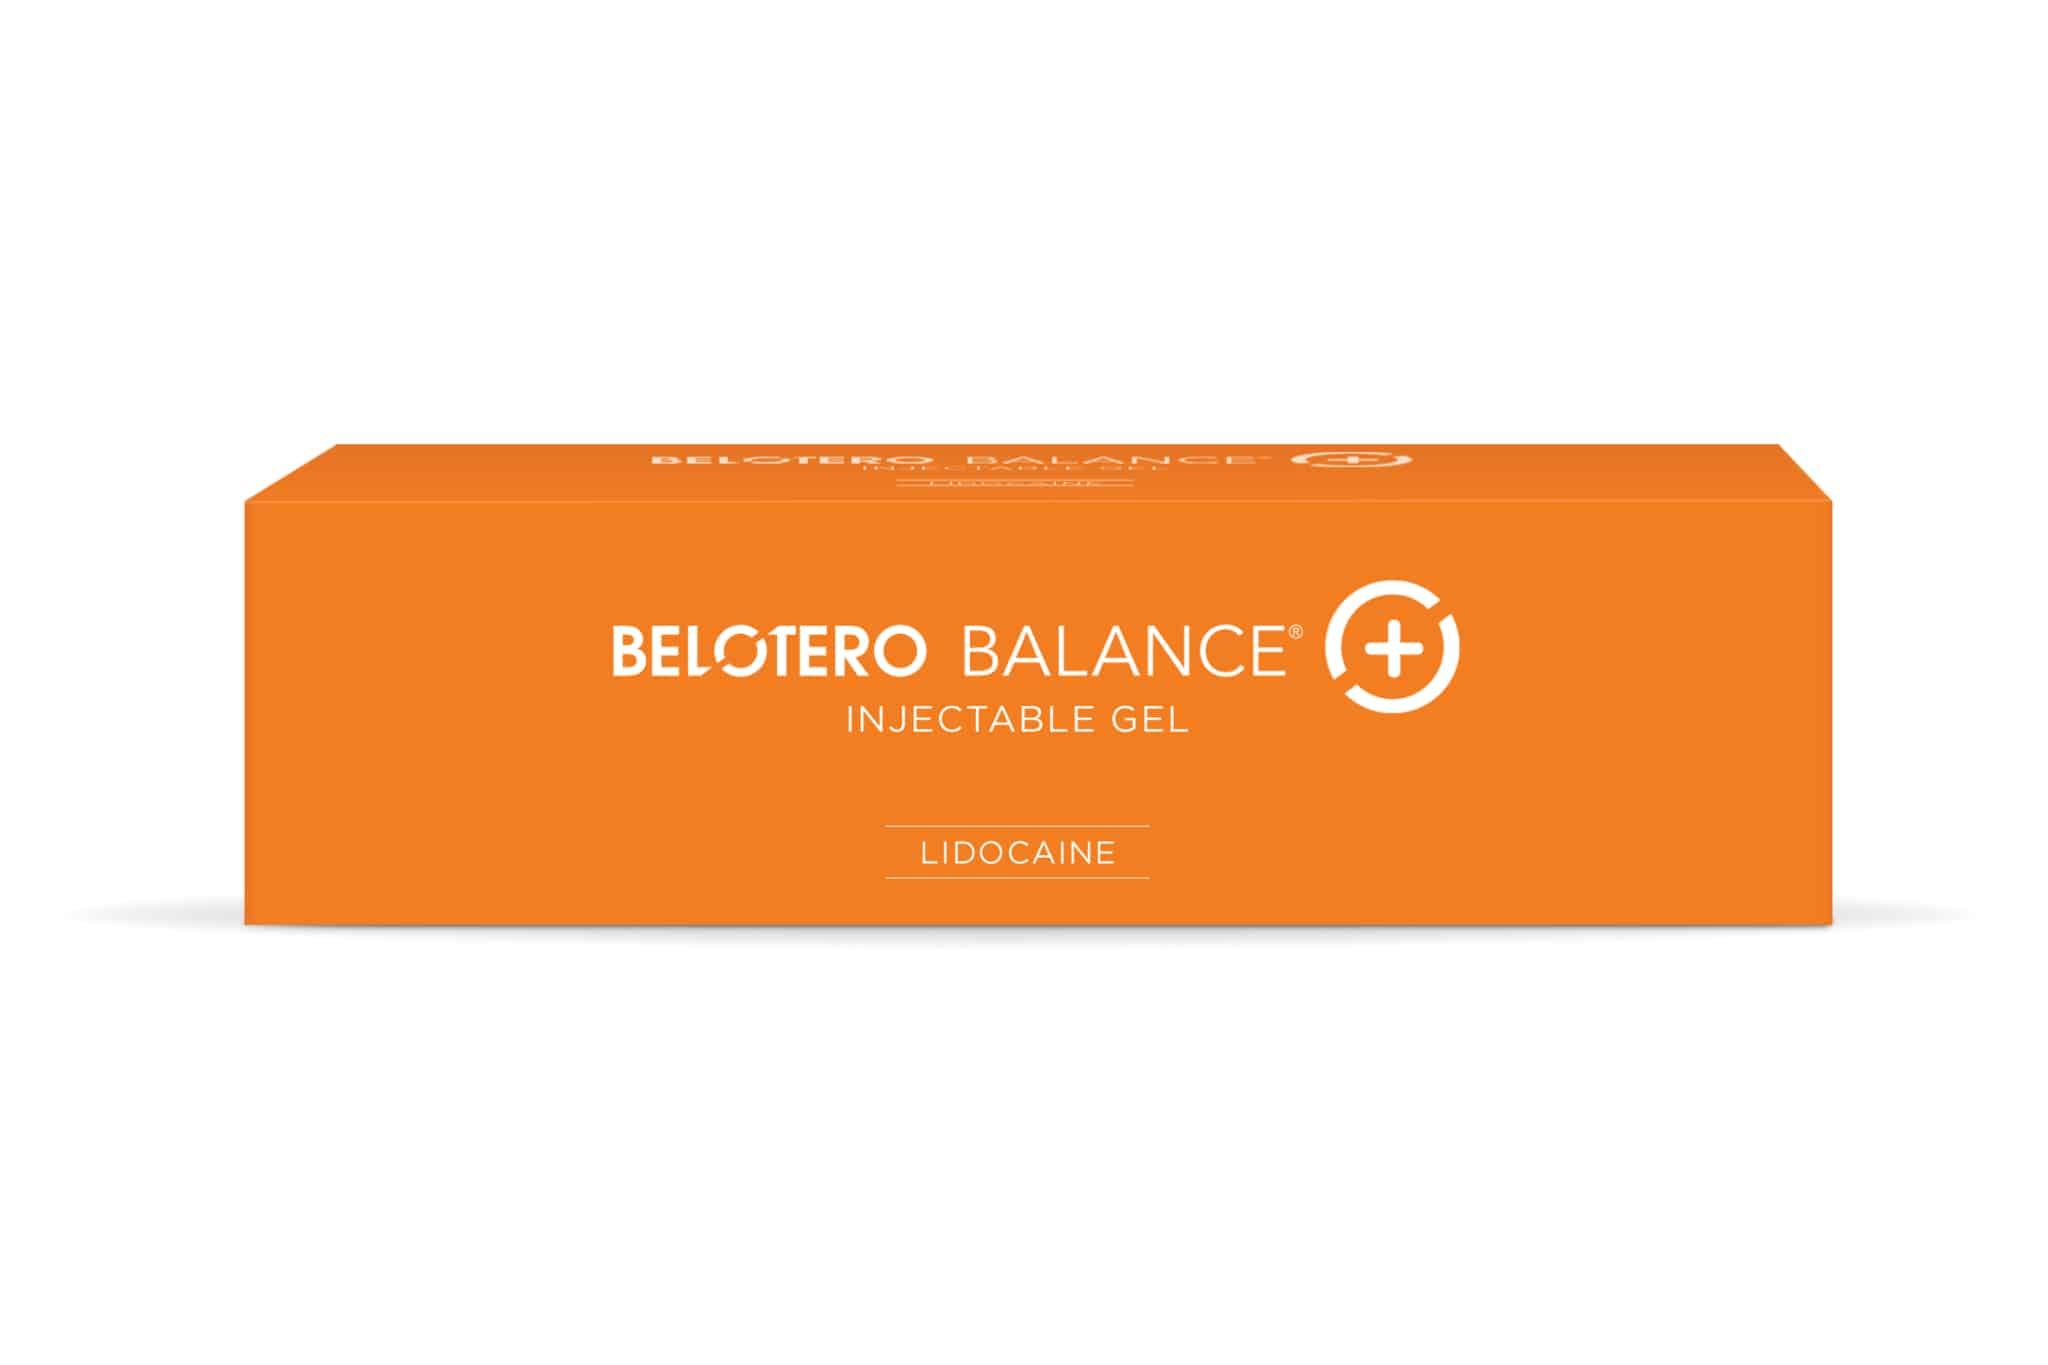 Belotero Balance Injectable Gel